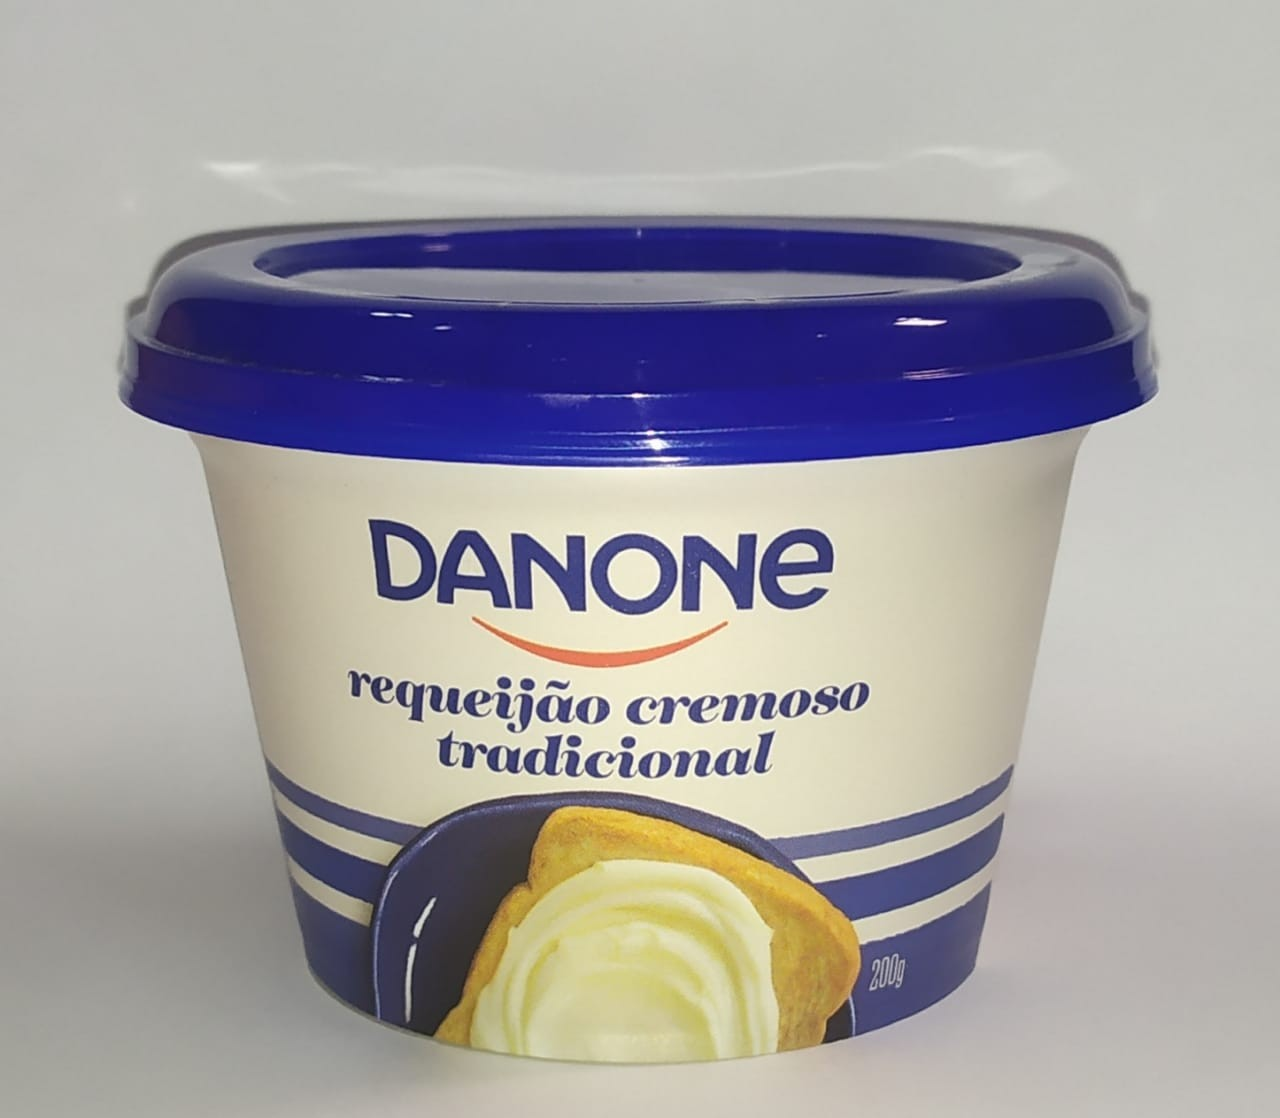 REQUEIJÃO CREMOSO DANONE TRADICIONAL 200G